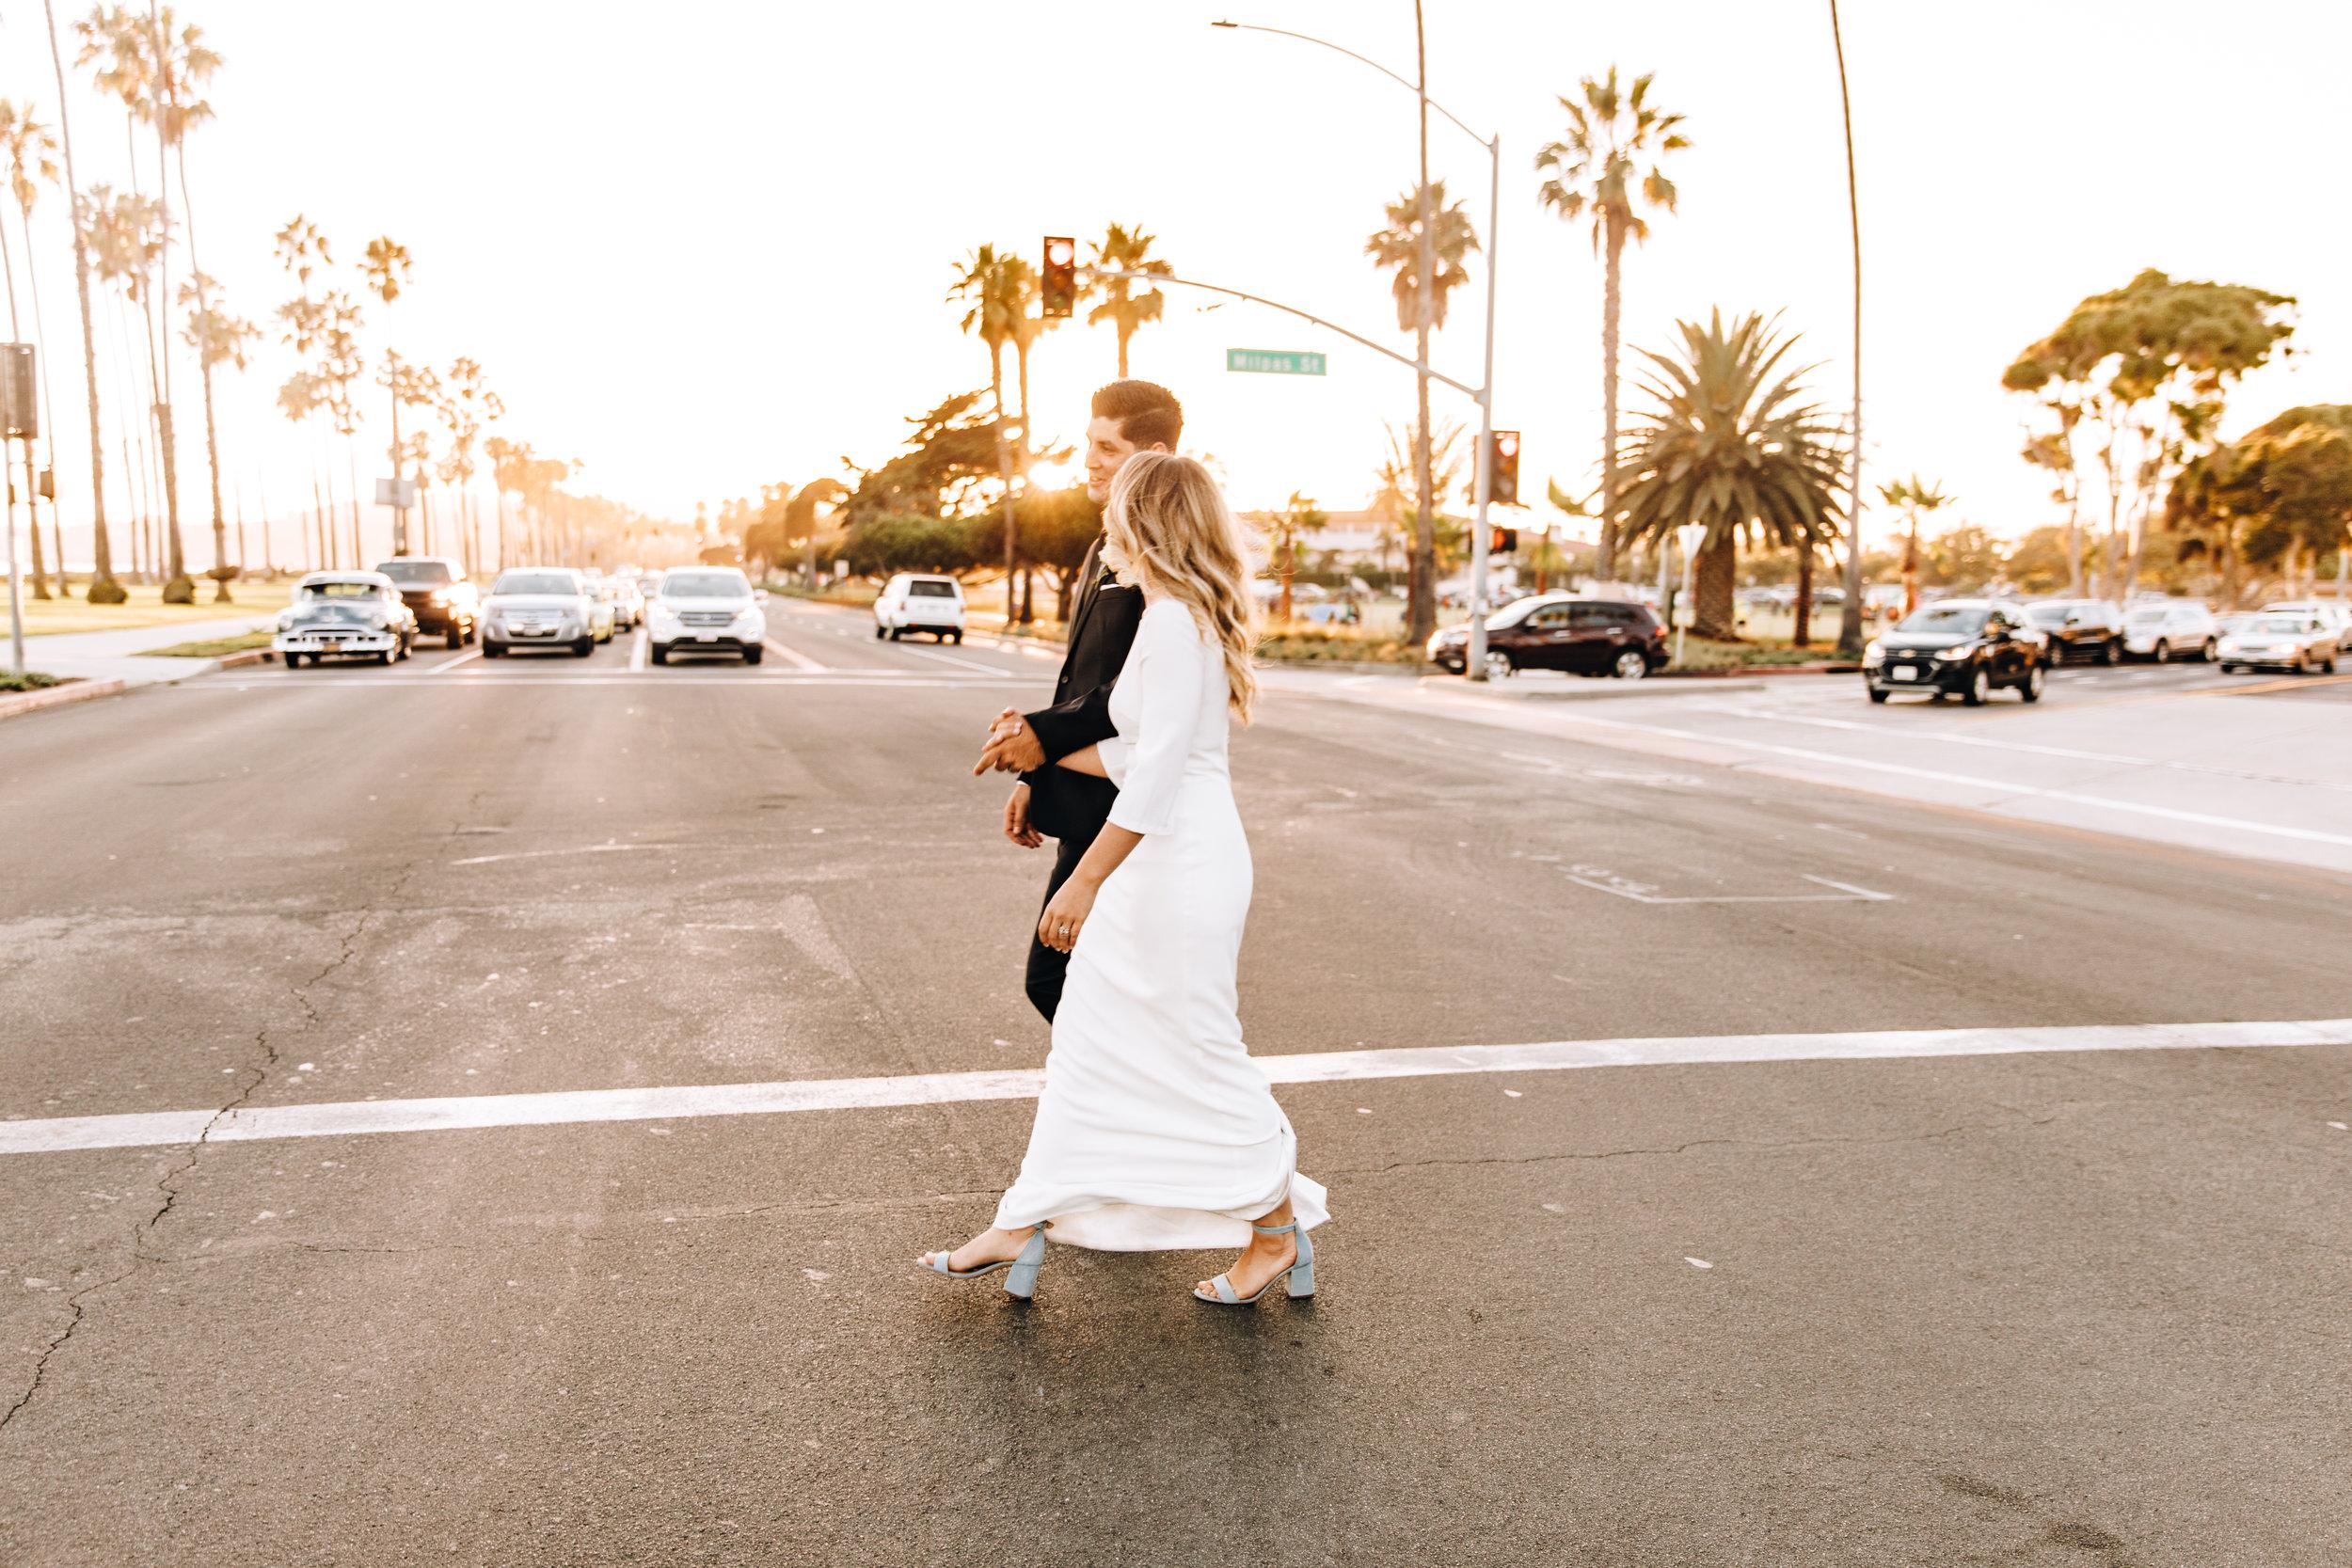 LA wedding photographer, Southern California wedding photographer, Los Angeles wedding photographer, SoCal wedding photographer, Santa Barbara wedding photographer, Santa Barbara Inn wedding